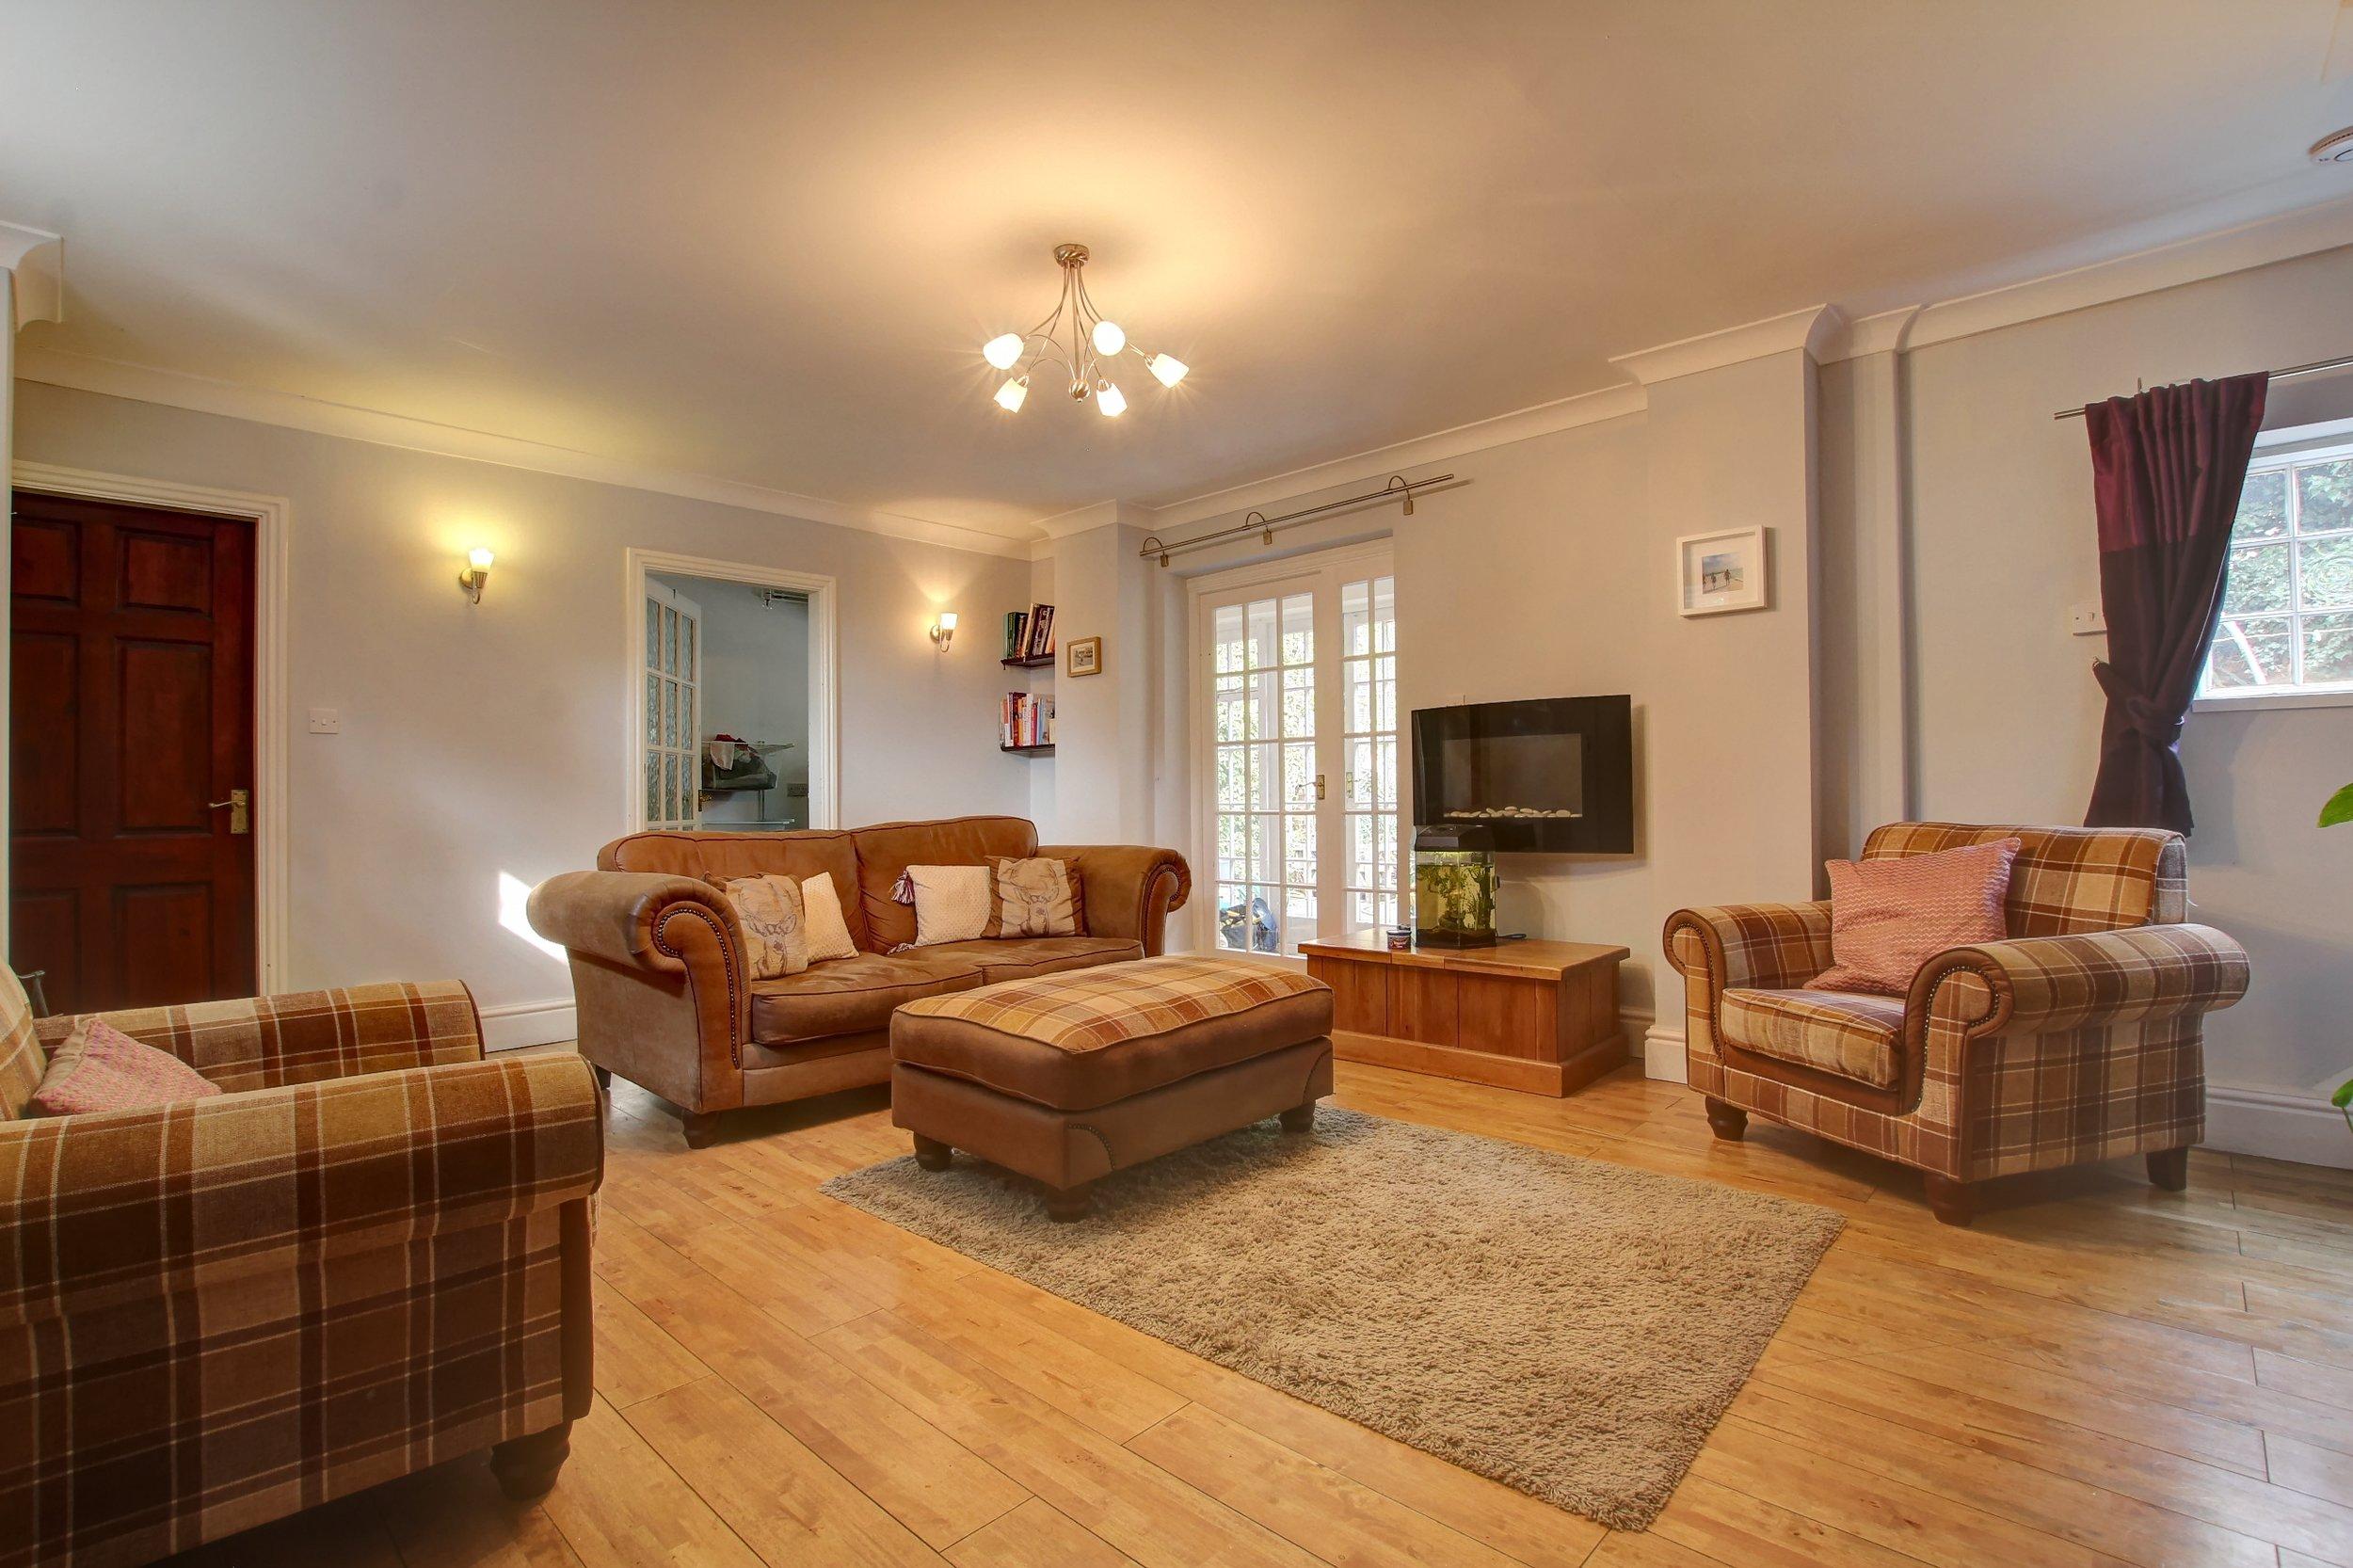 12 sitting room.jpg